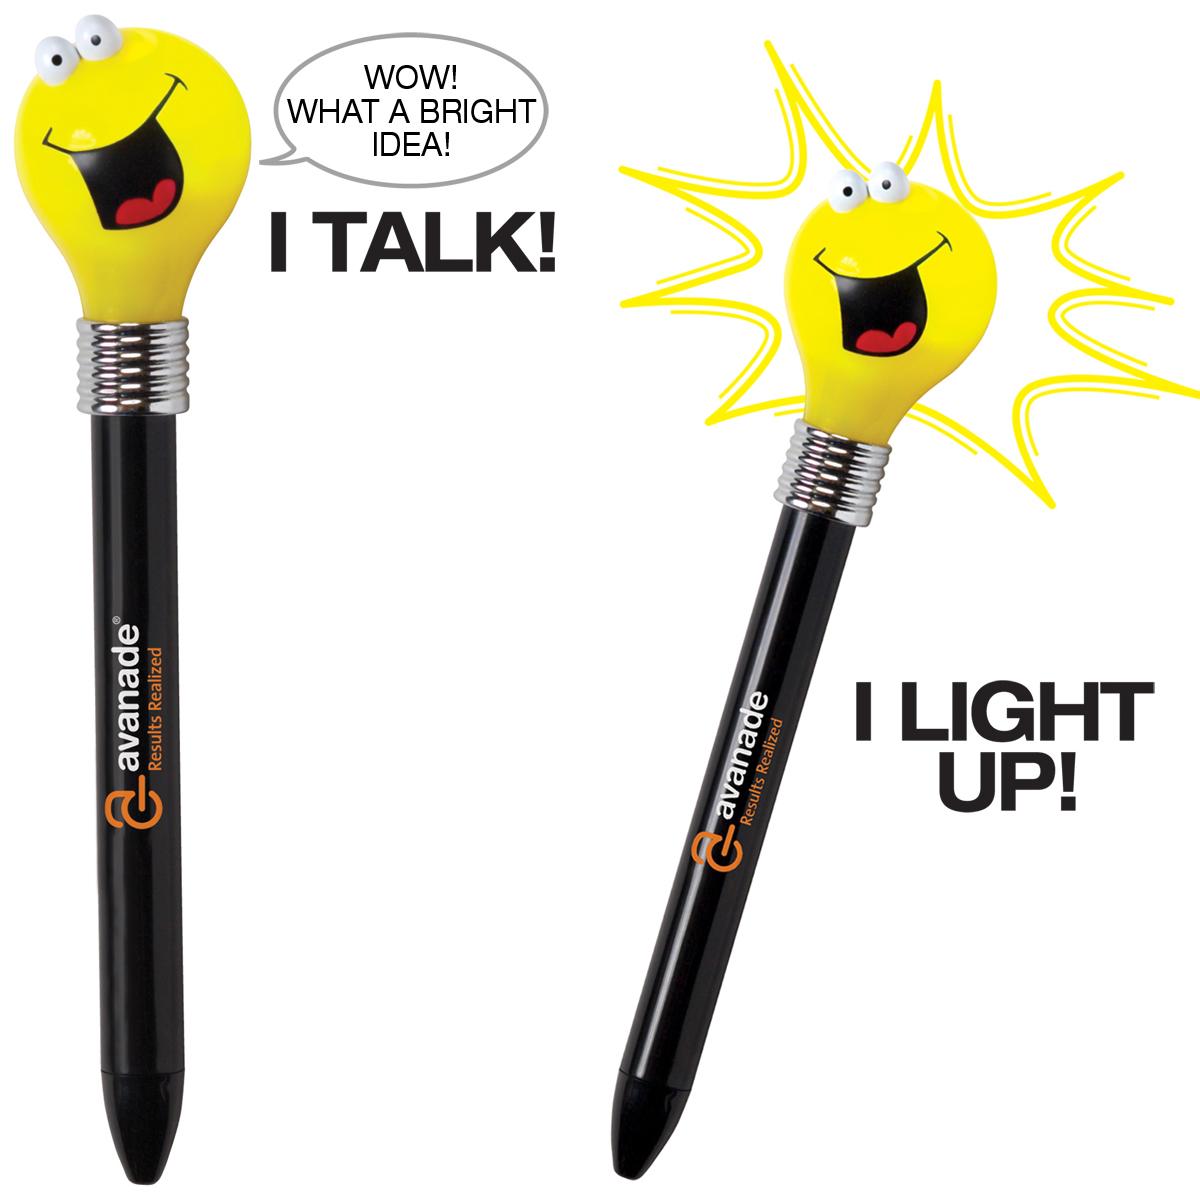 Novelty Lights Promotional Codes : Promotional Goofy Light Bulb Pen Customized Goofy Light Bulb Pen Promotional Novelty Pens